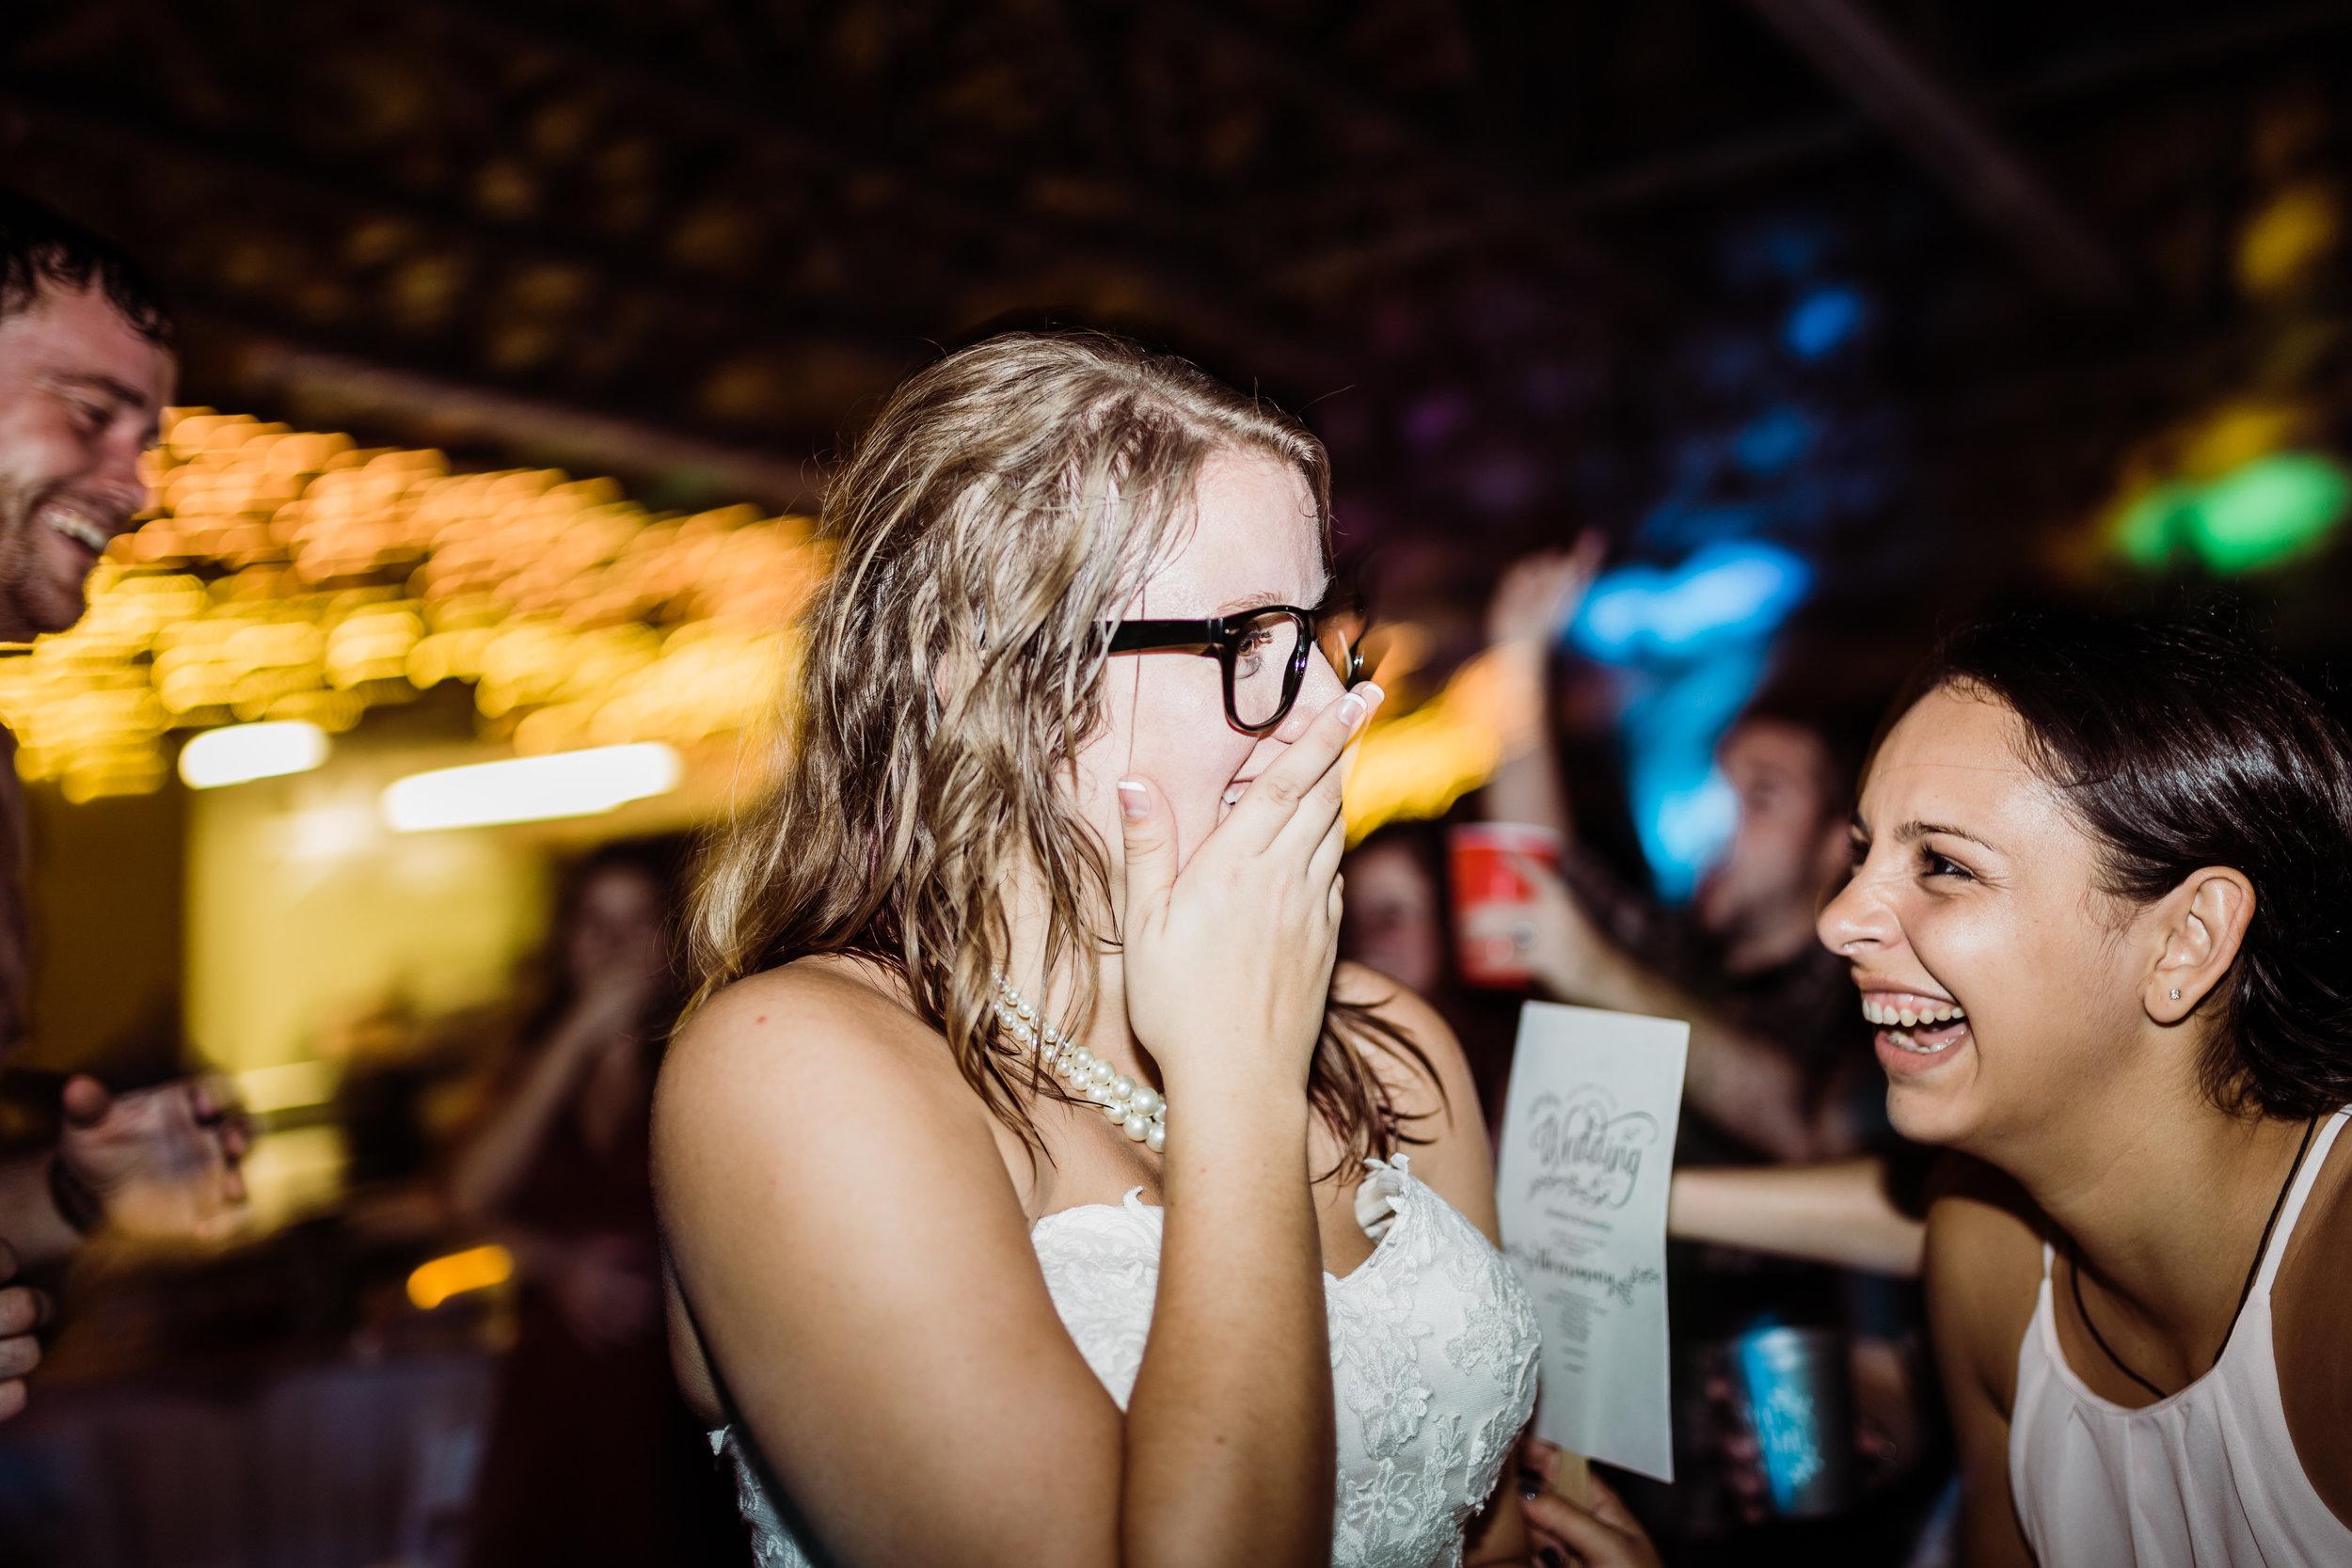 2017.10.14 Samantha and Matthew Crabtree Sarasota Wedding (678 of 708).jpg